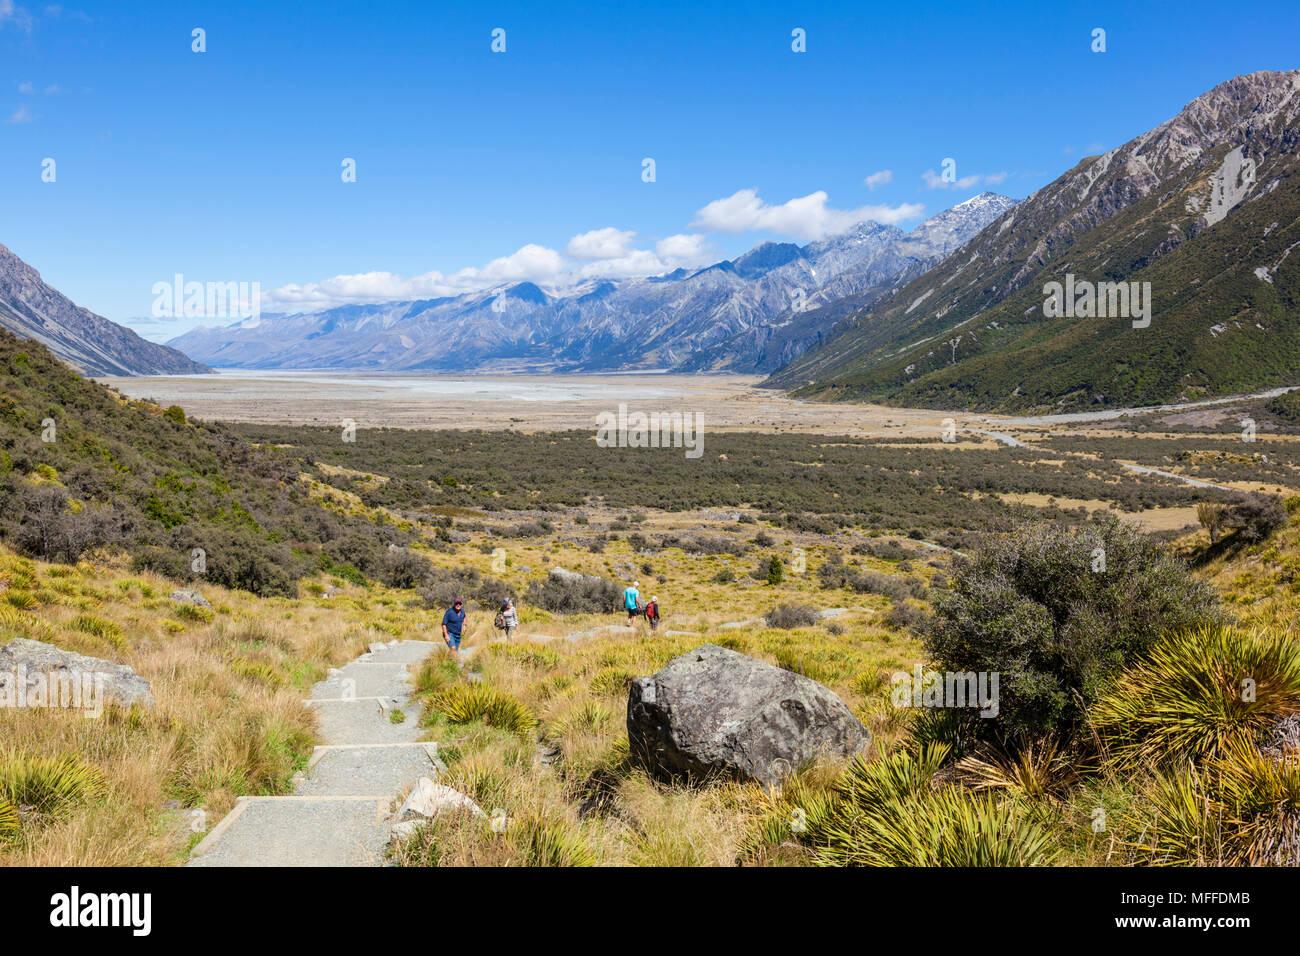 Cook National Park boardwalk Pfad der Tasman Gletscher Neuseeland Südinsel Neuseeland Mount Stockbild